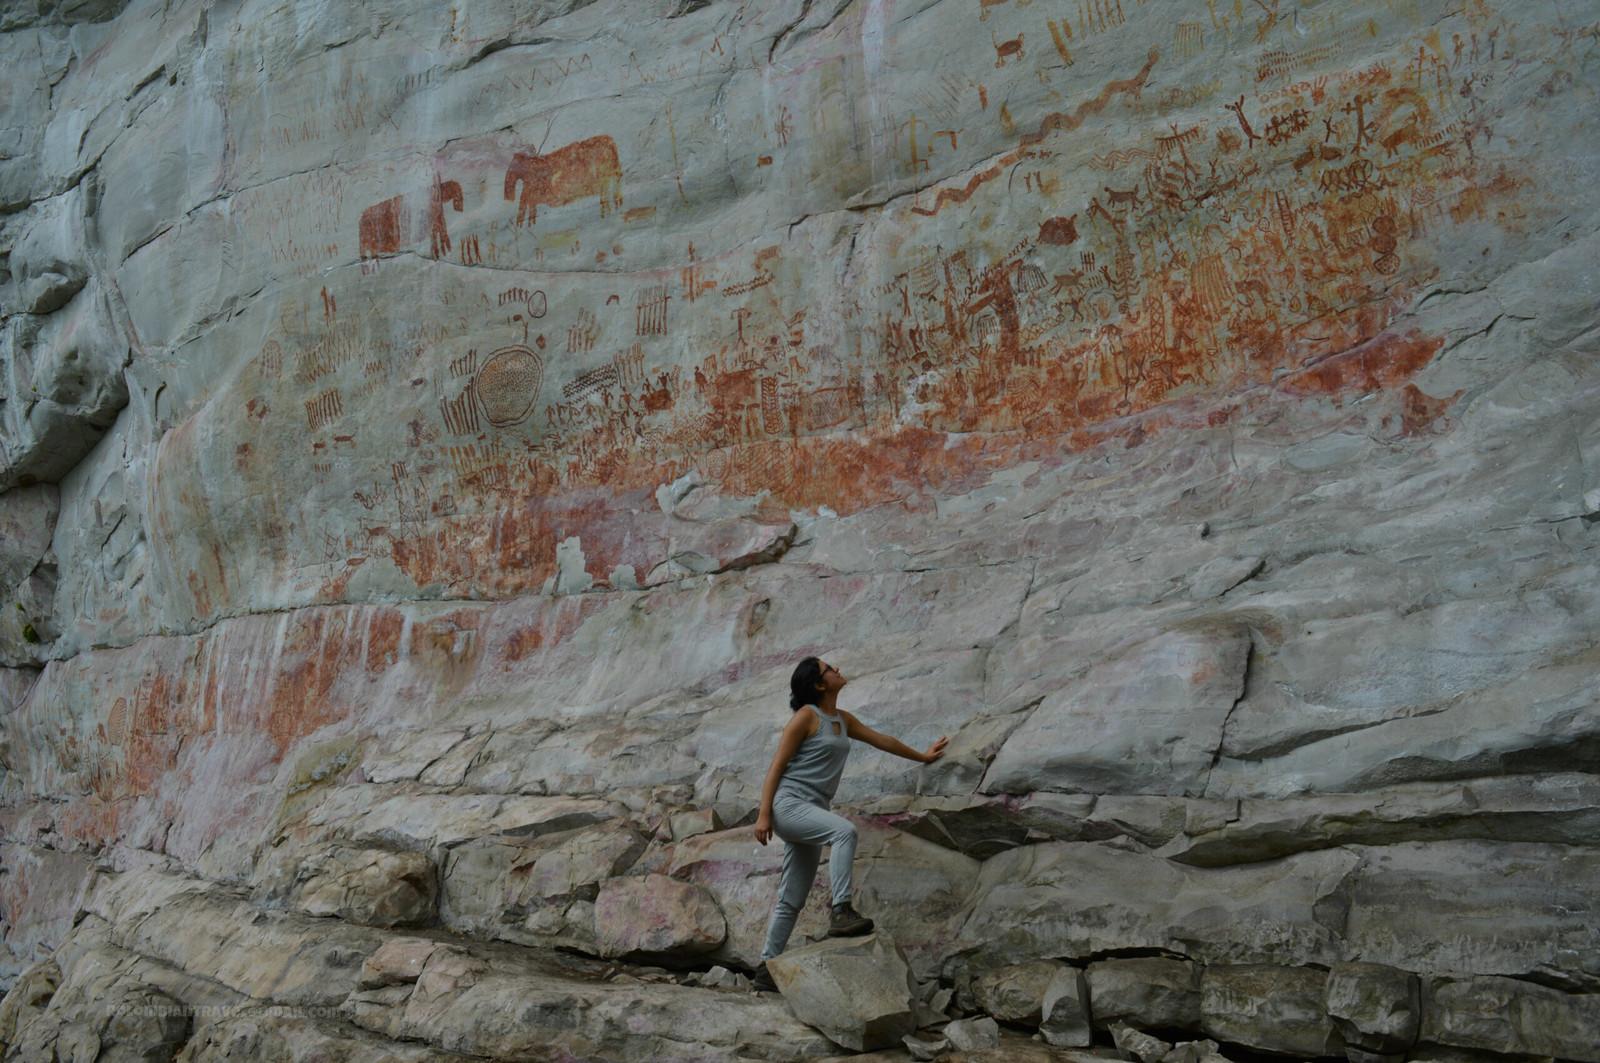 Cerro pinturas. Foto: rolombiantravel.com